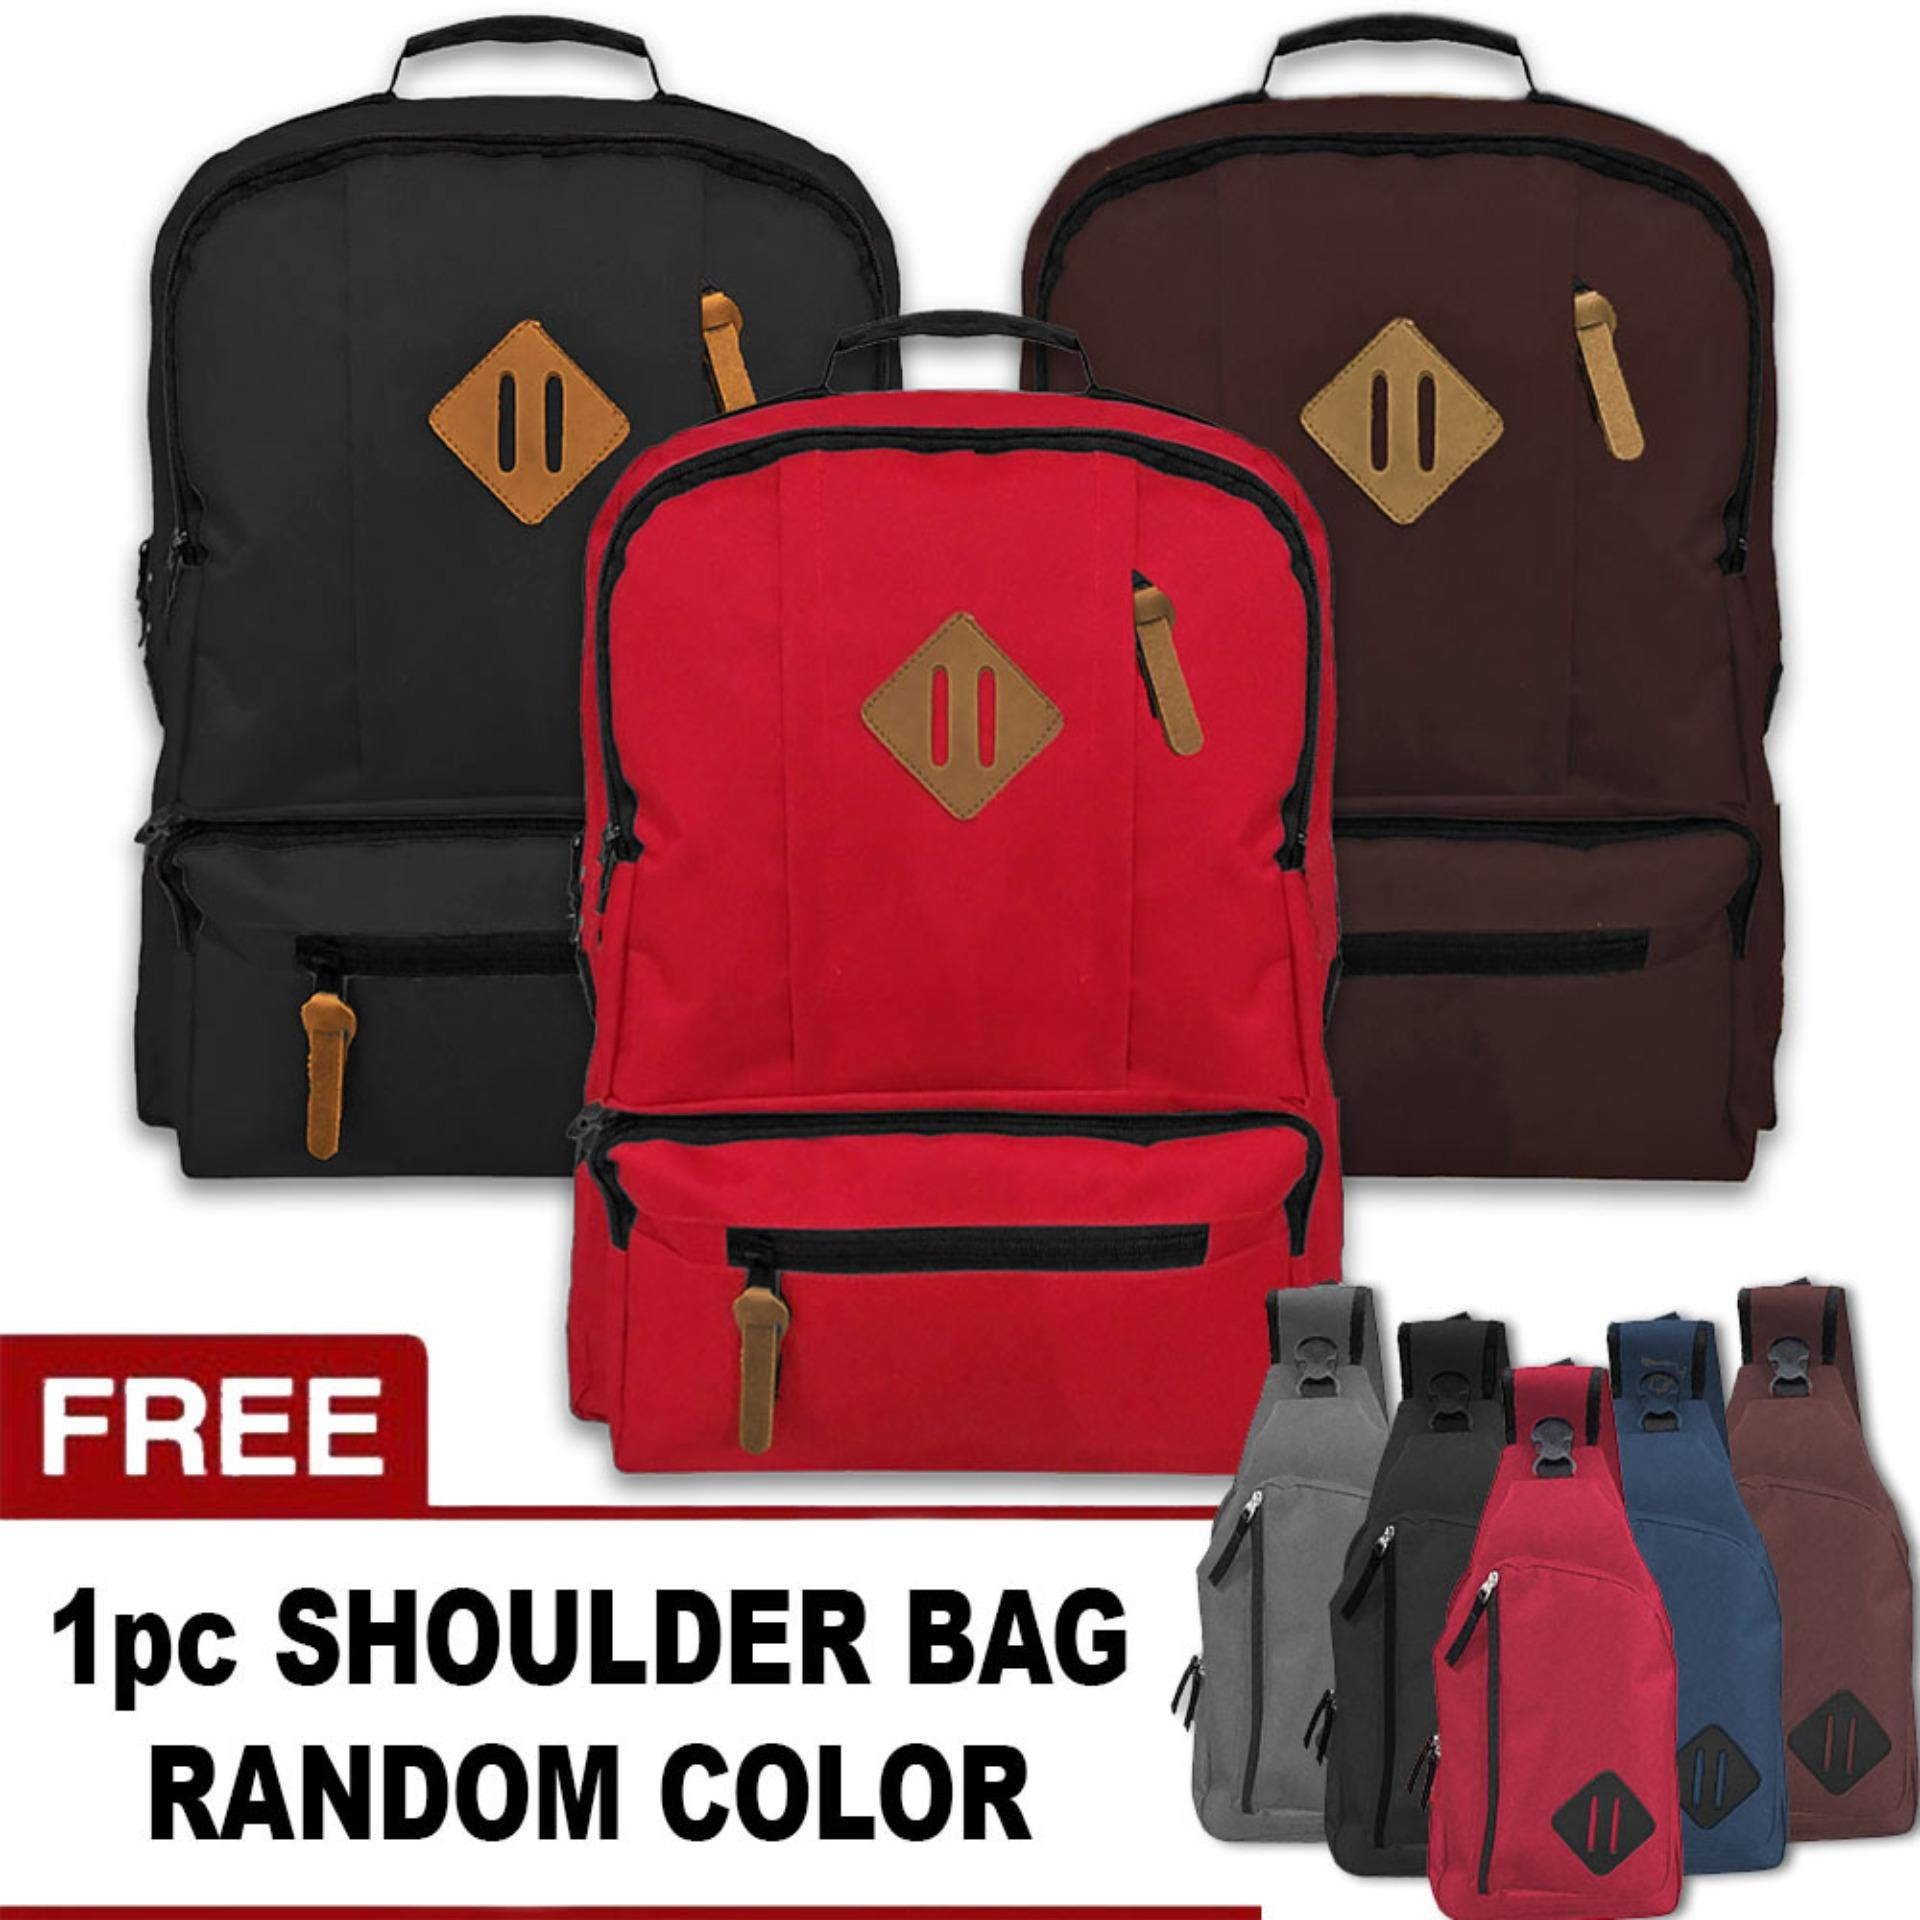 BUNDLE - 1 Swedia Laptop Backpack Up To 13 Inchi + FREE 1 Pentagon Shoulder Bag Random  / Tas Ransel / Tas Laptop / Tas Pria / Tas Wanita / Tas Sekolah / Tas Punggung